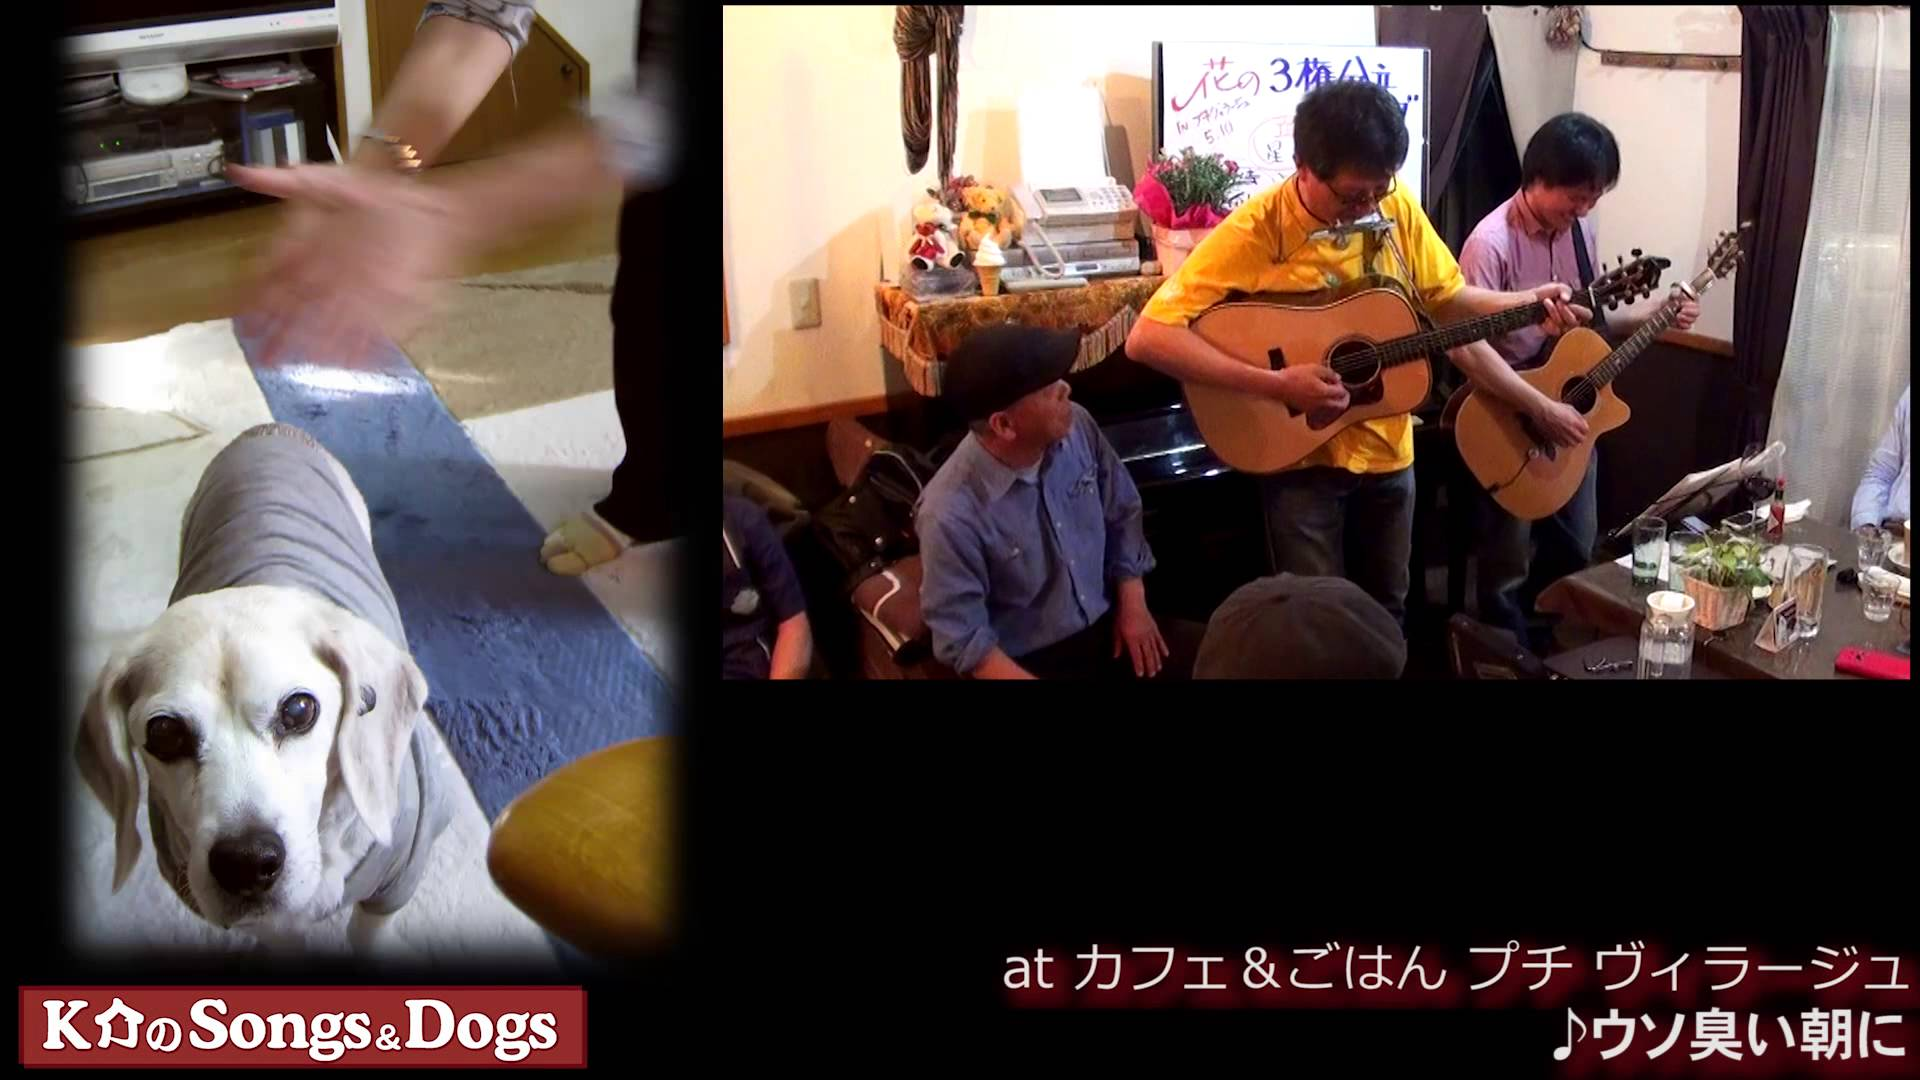 K介のSongs&Dogs週末はミュージシャン77